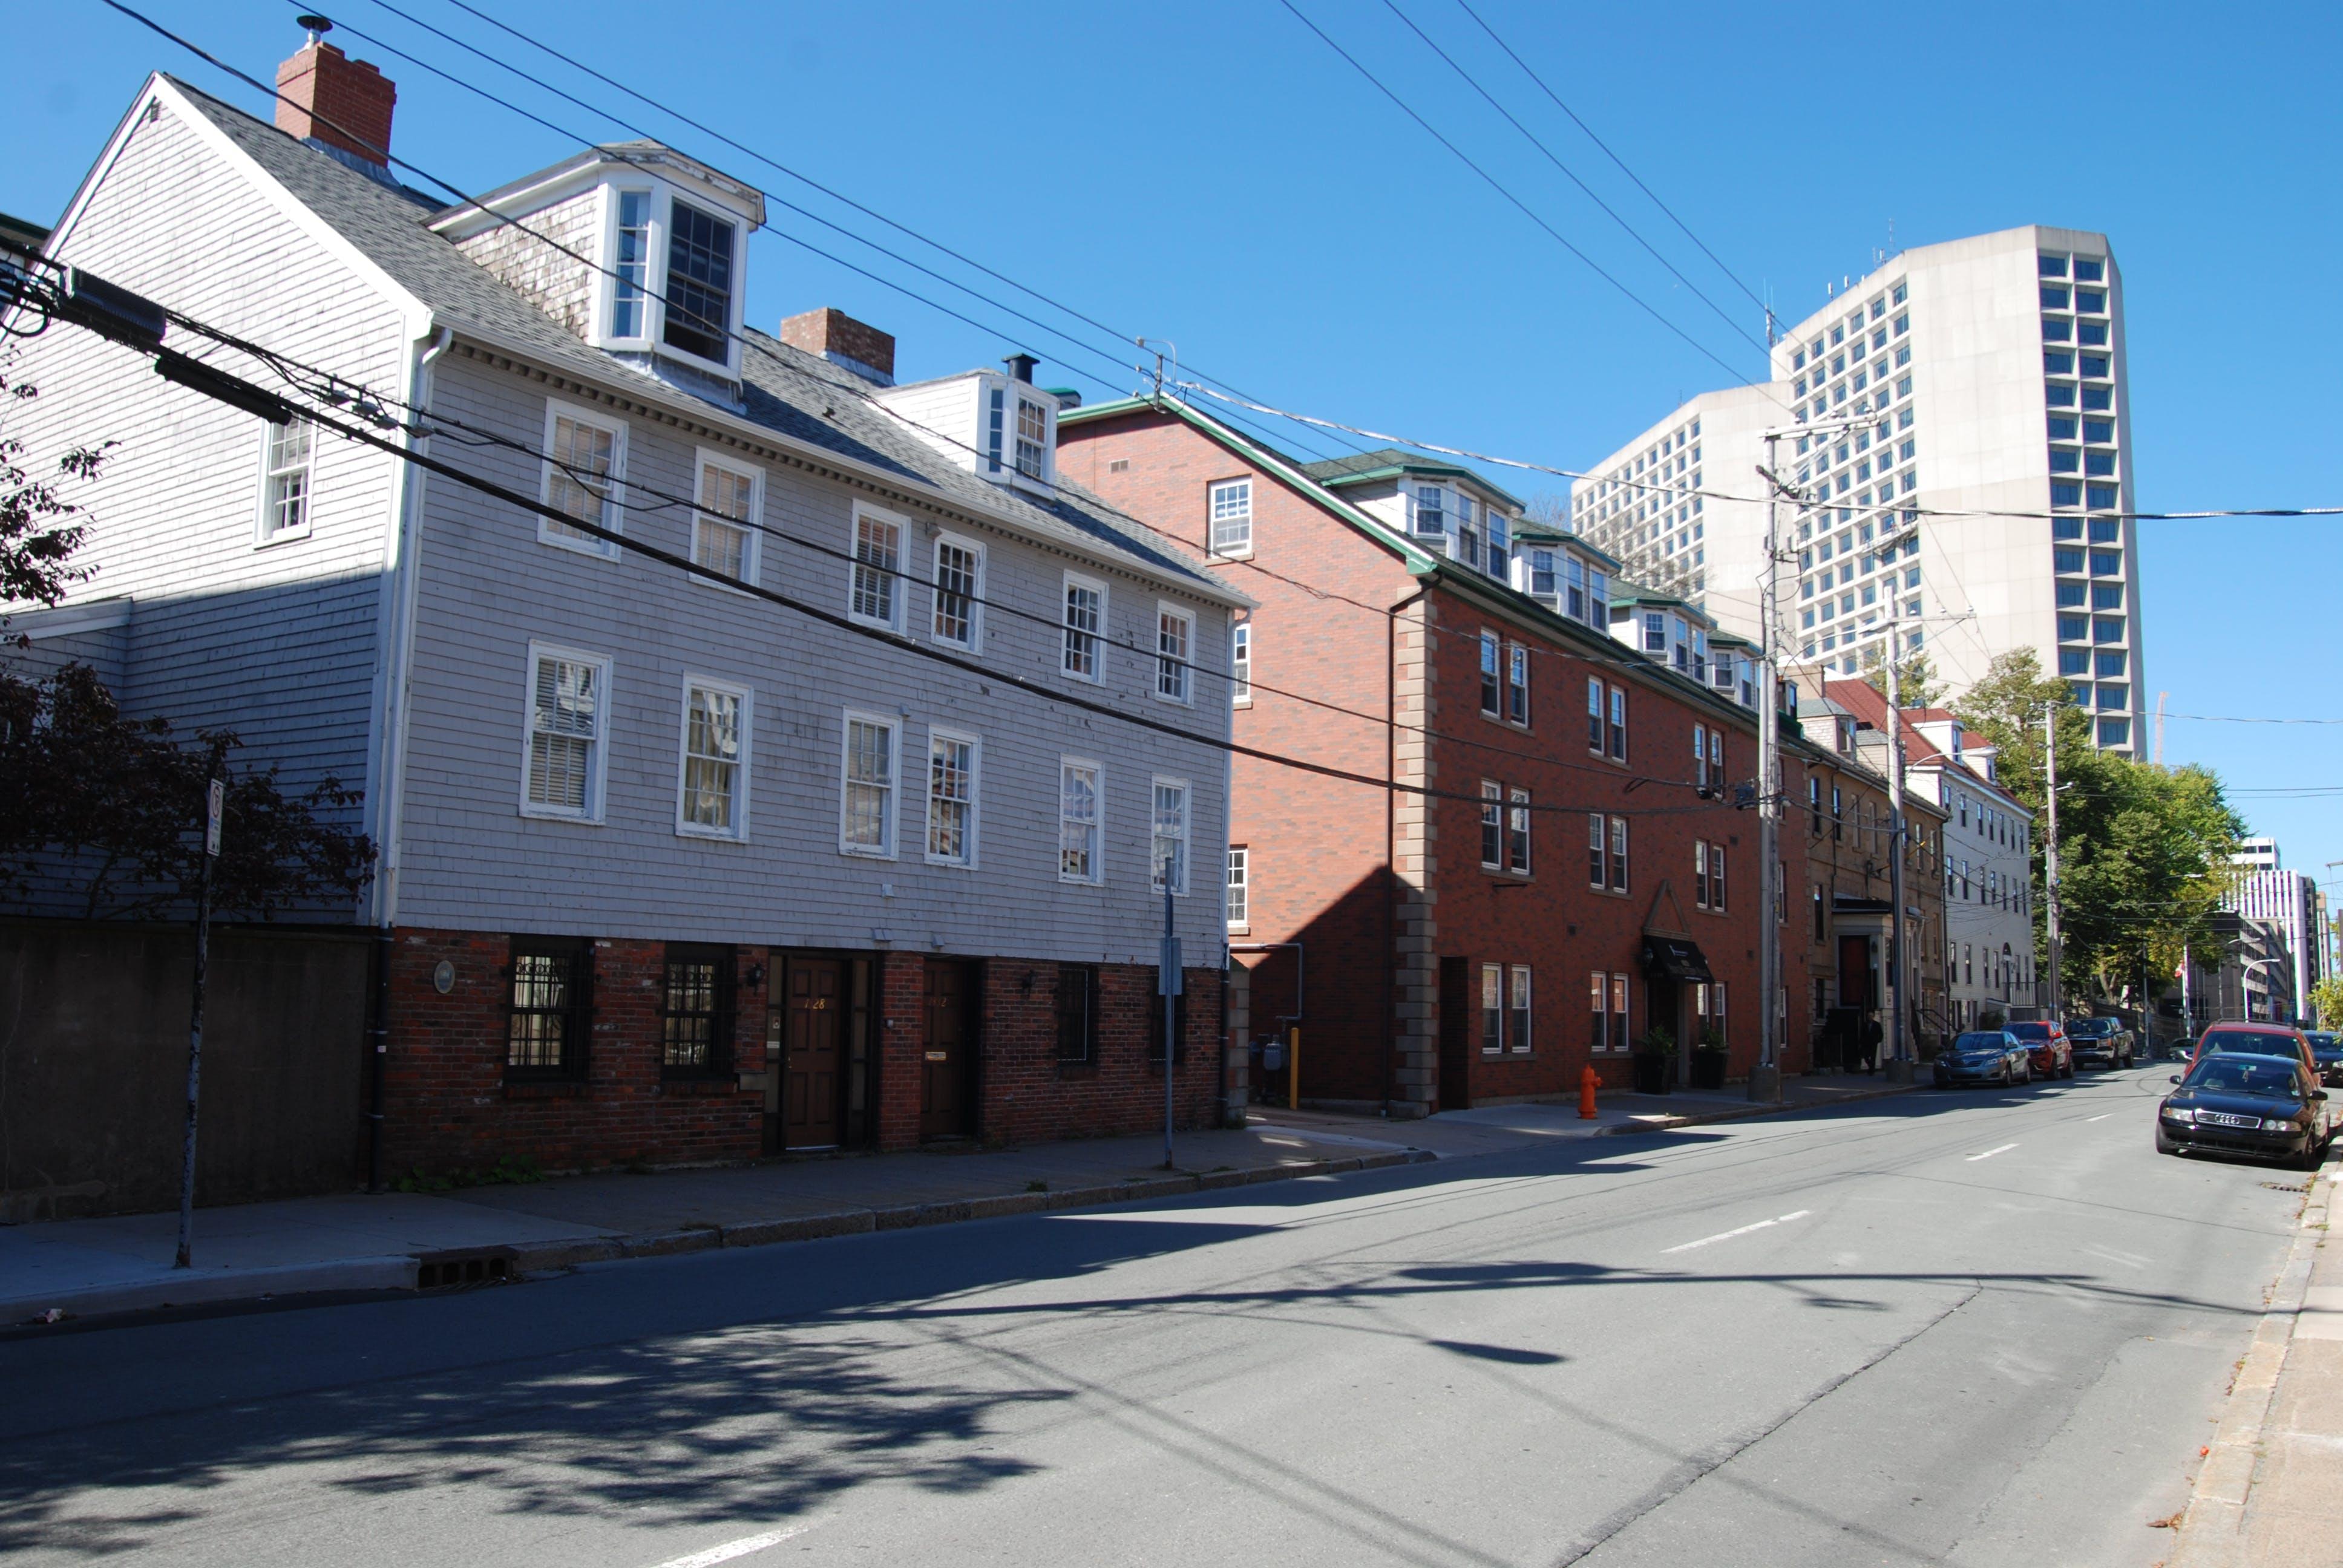 Alexander McLean House along Hollis Street